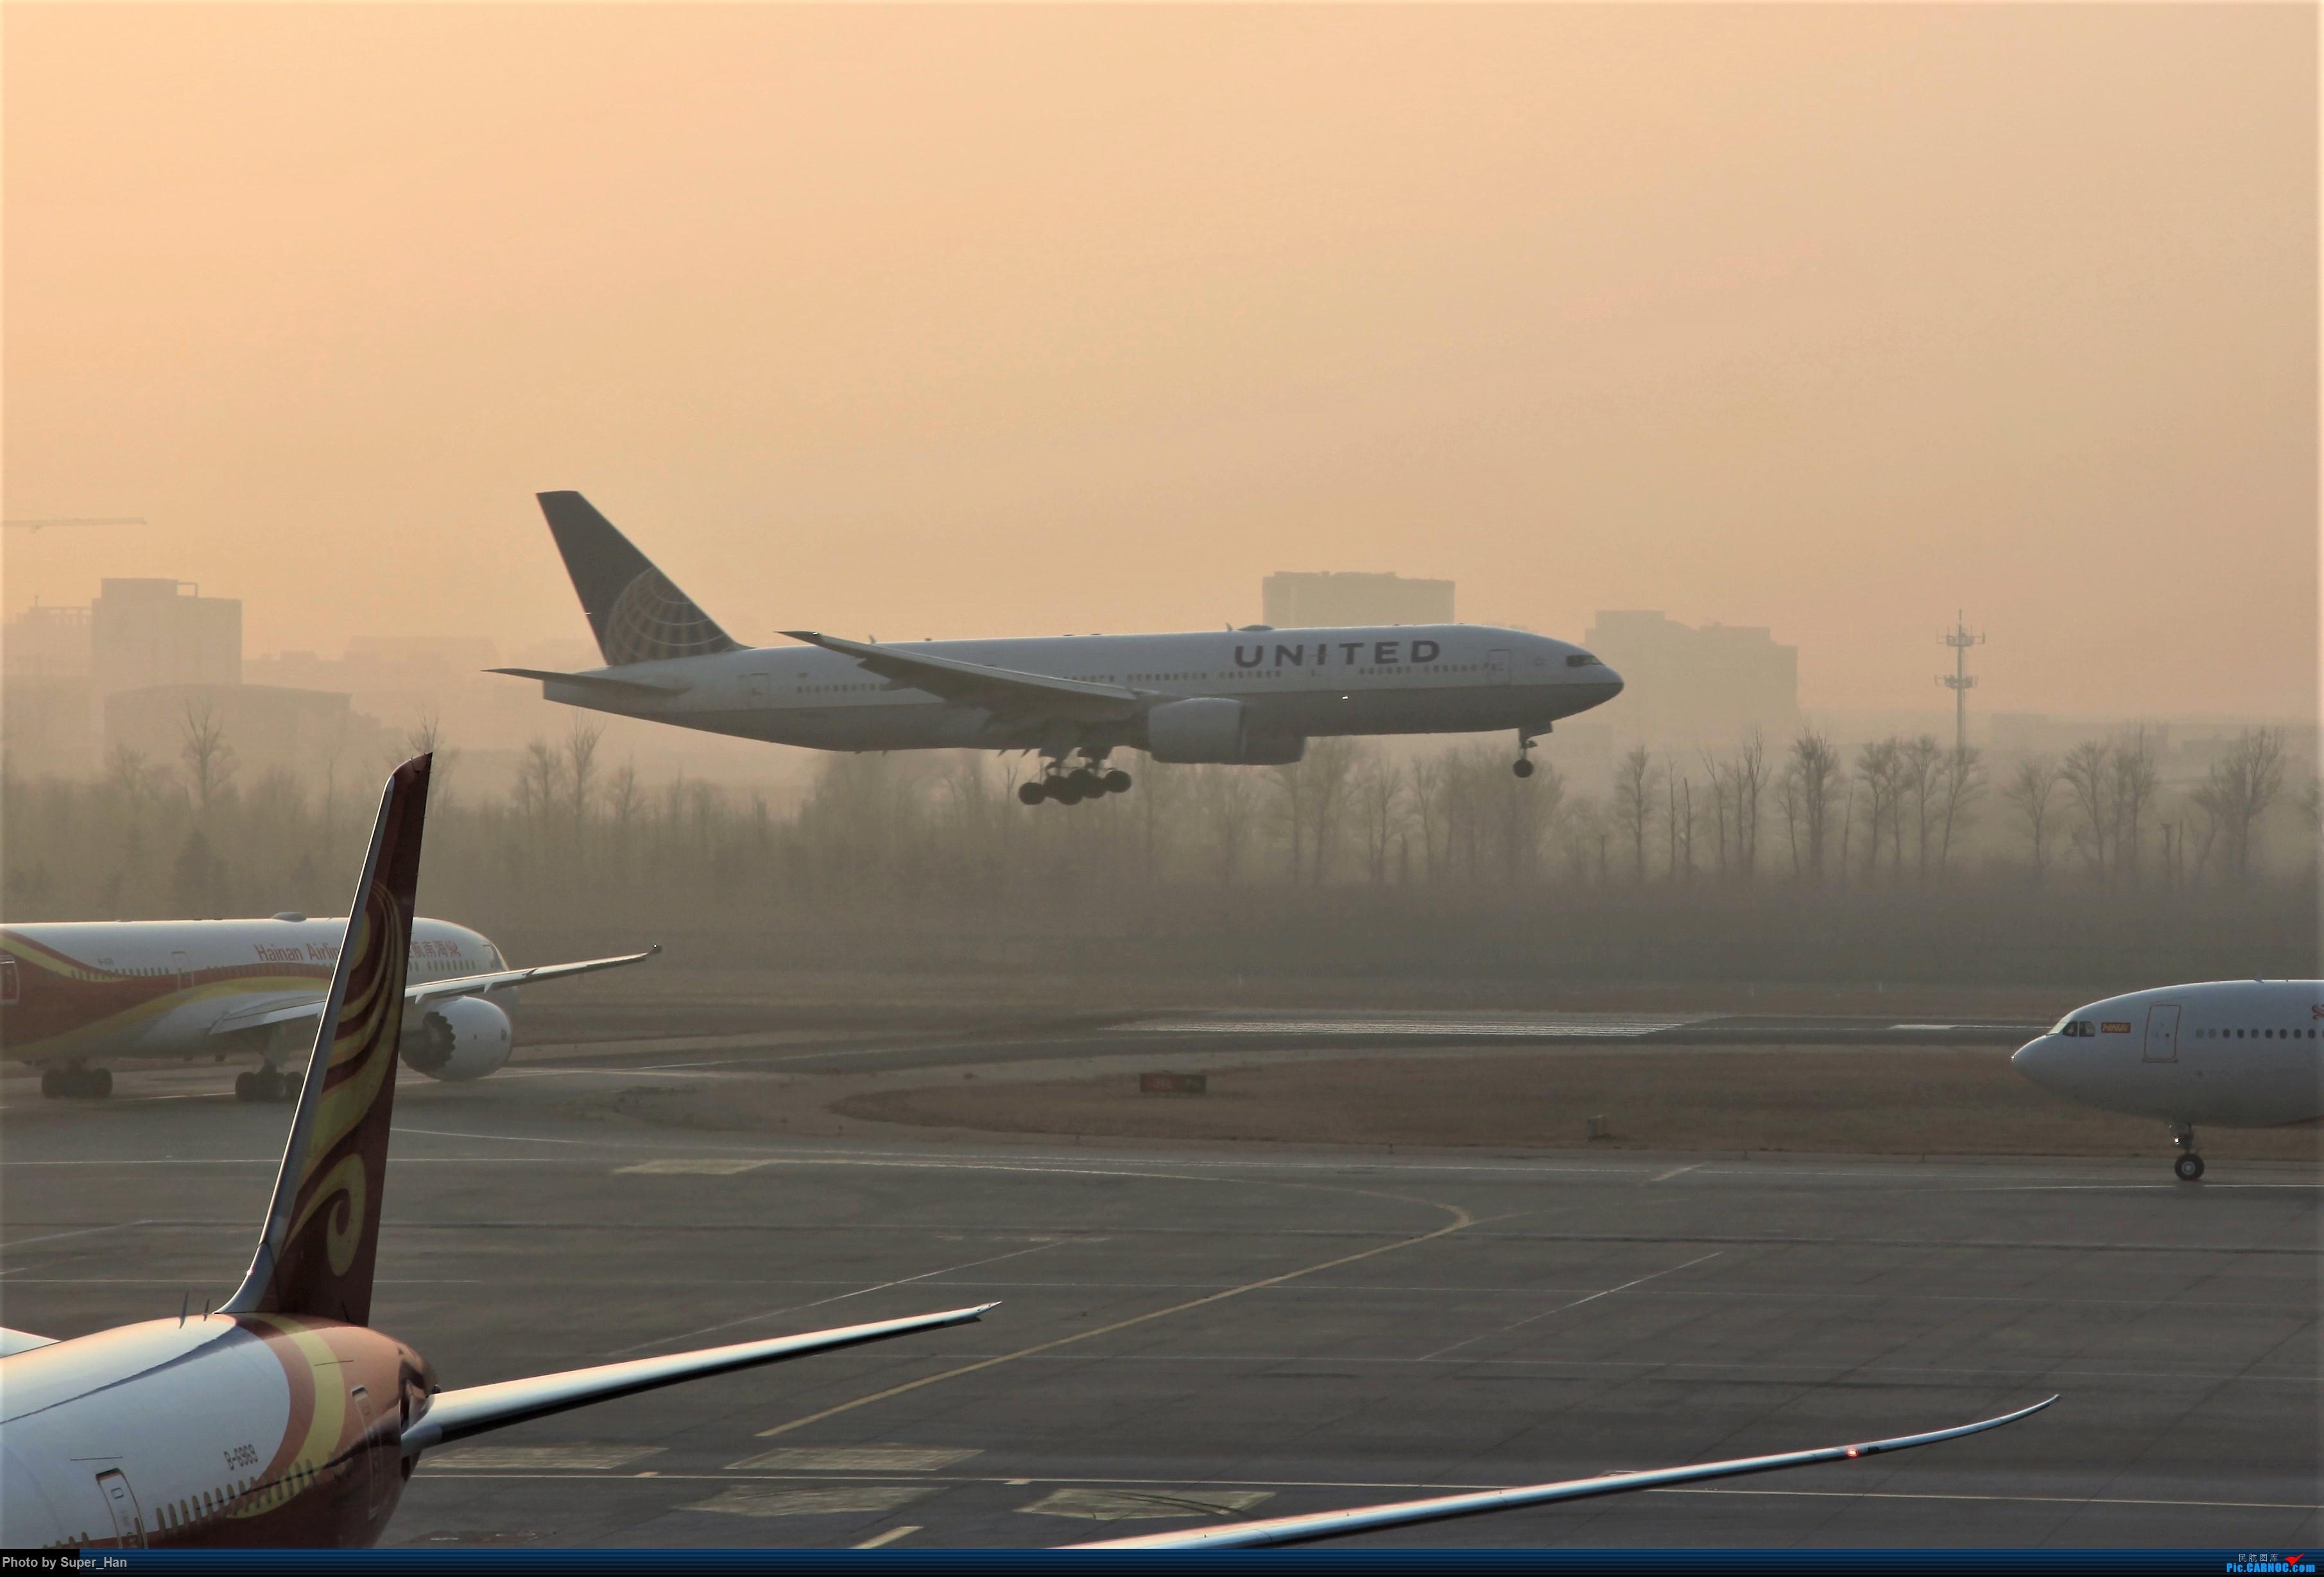 Re:[原创]2019虹桥出发飞北京第一拍 BOEING 777-200ER  中国北京首都国际机场